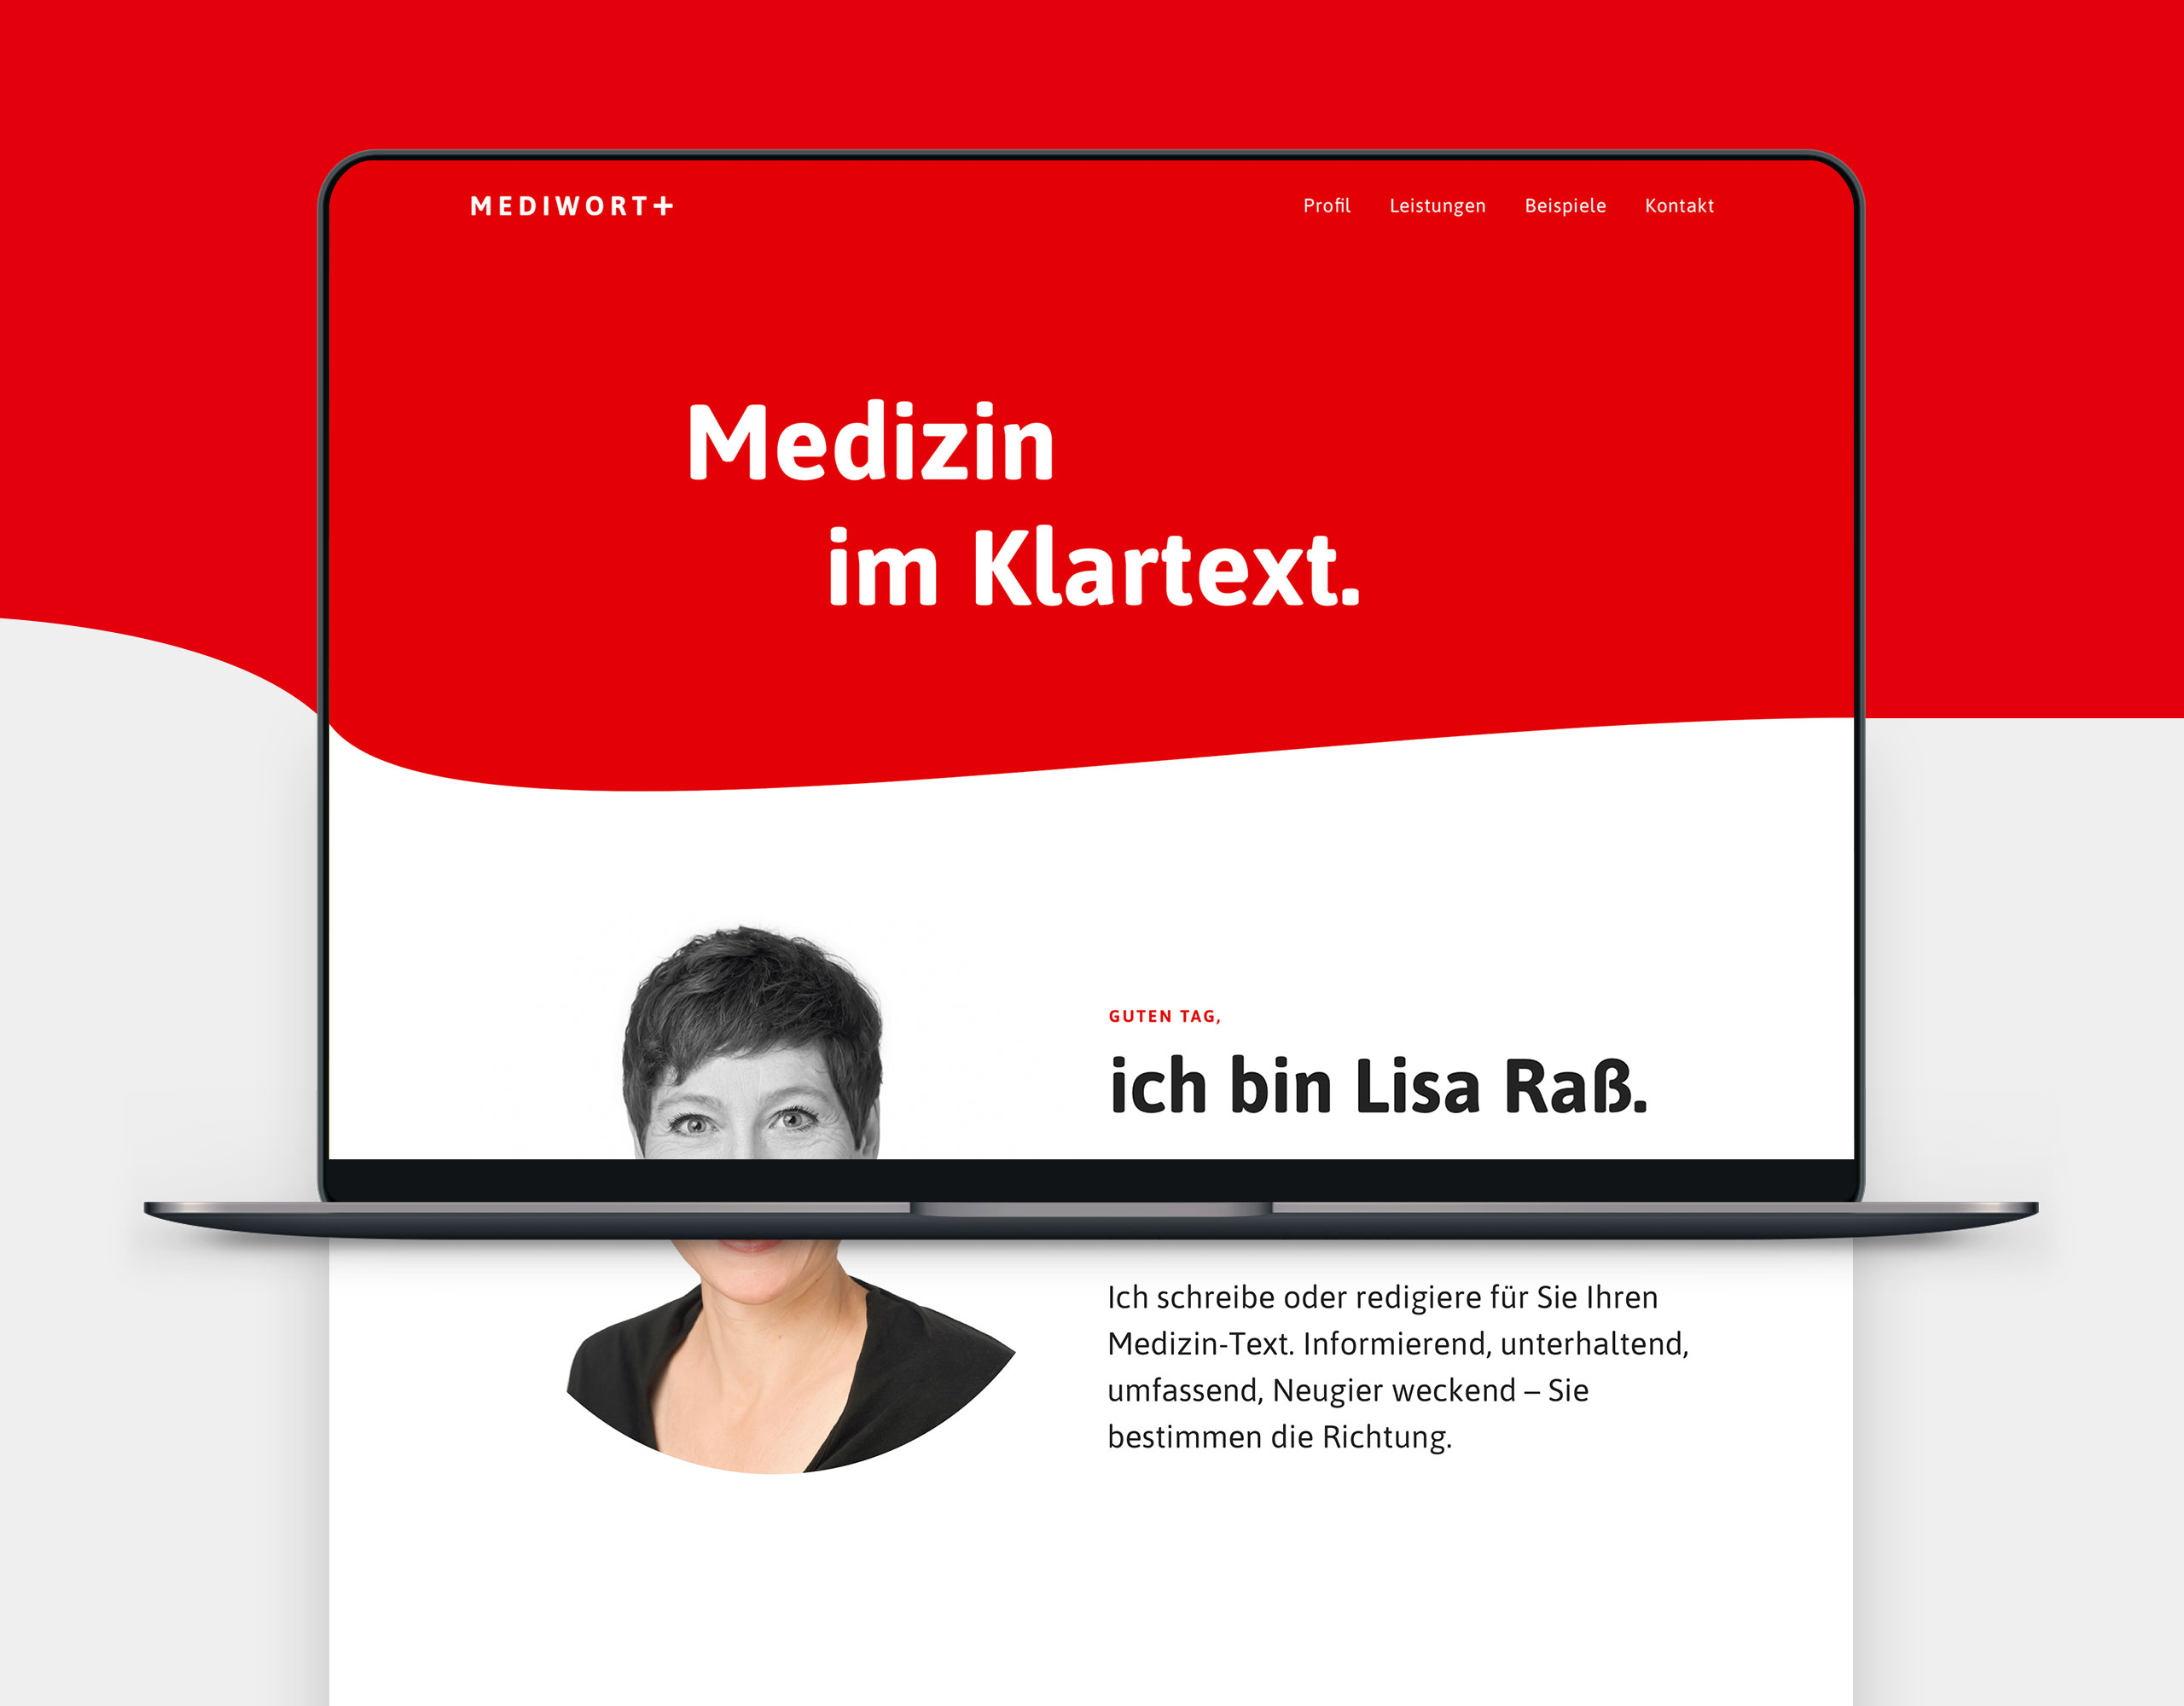 mediwort webdesign 1 laptop